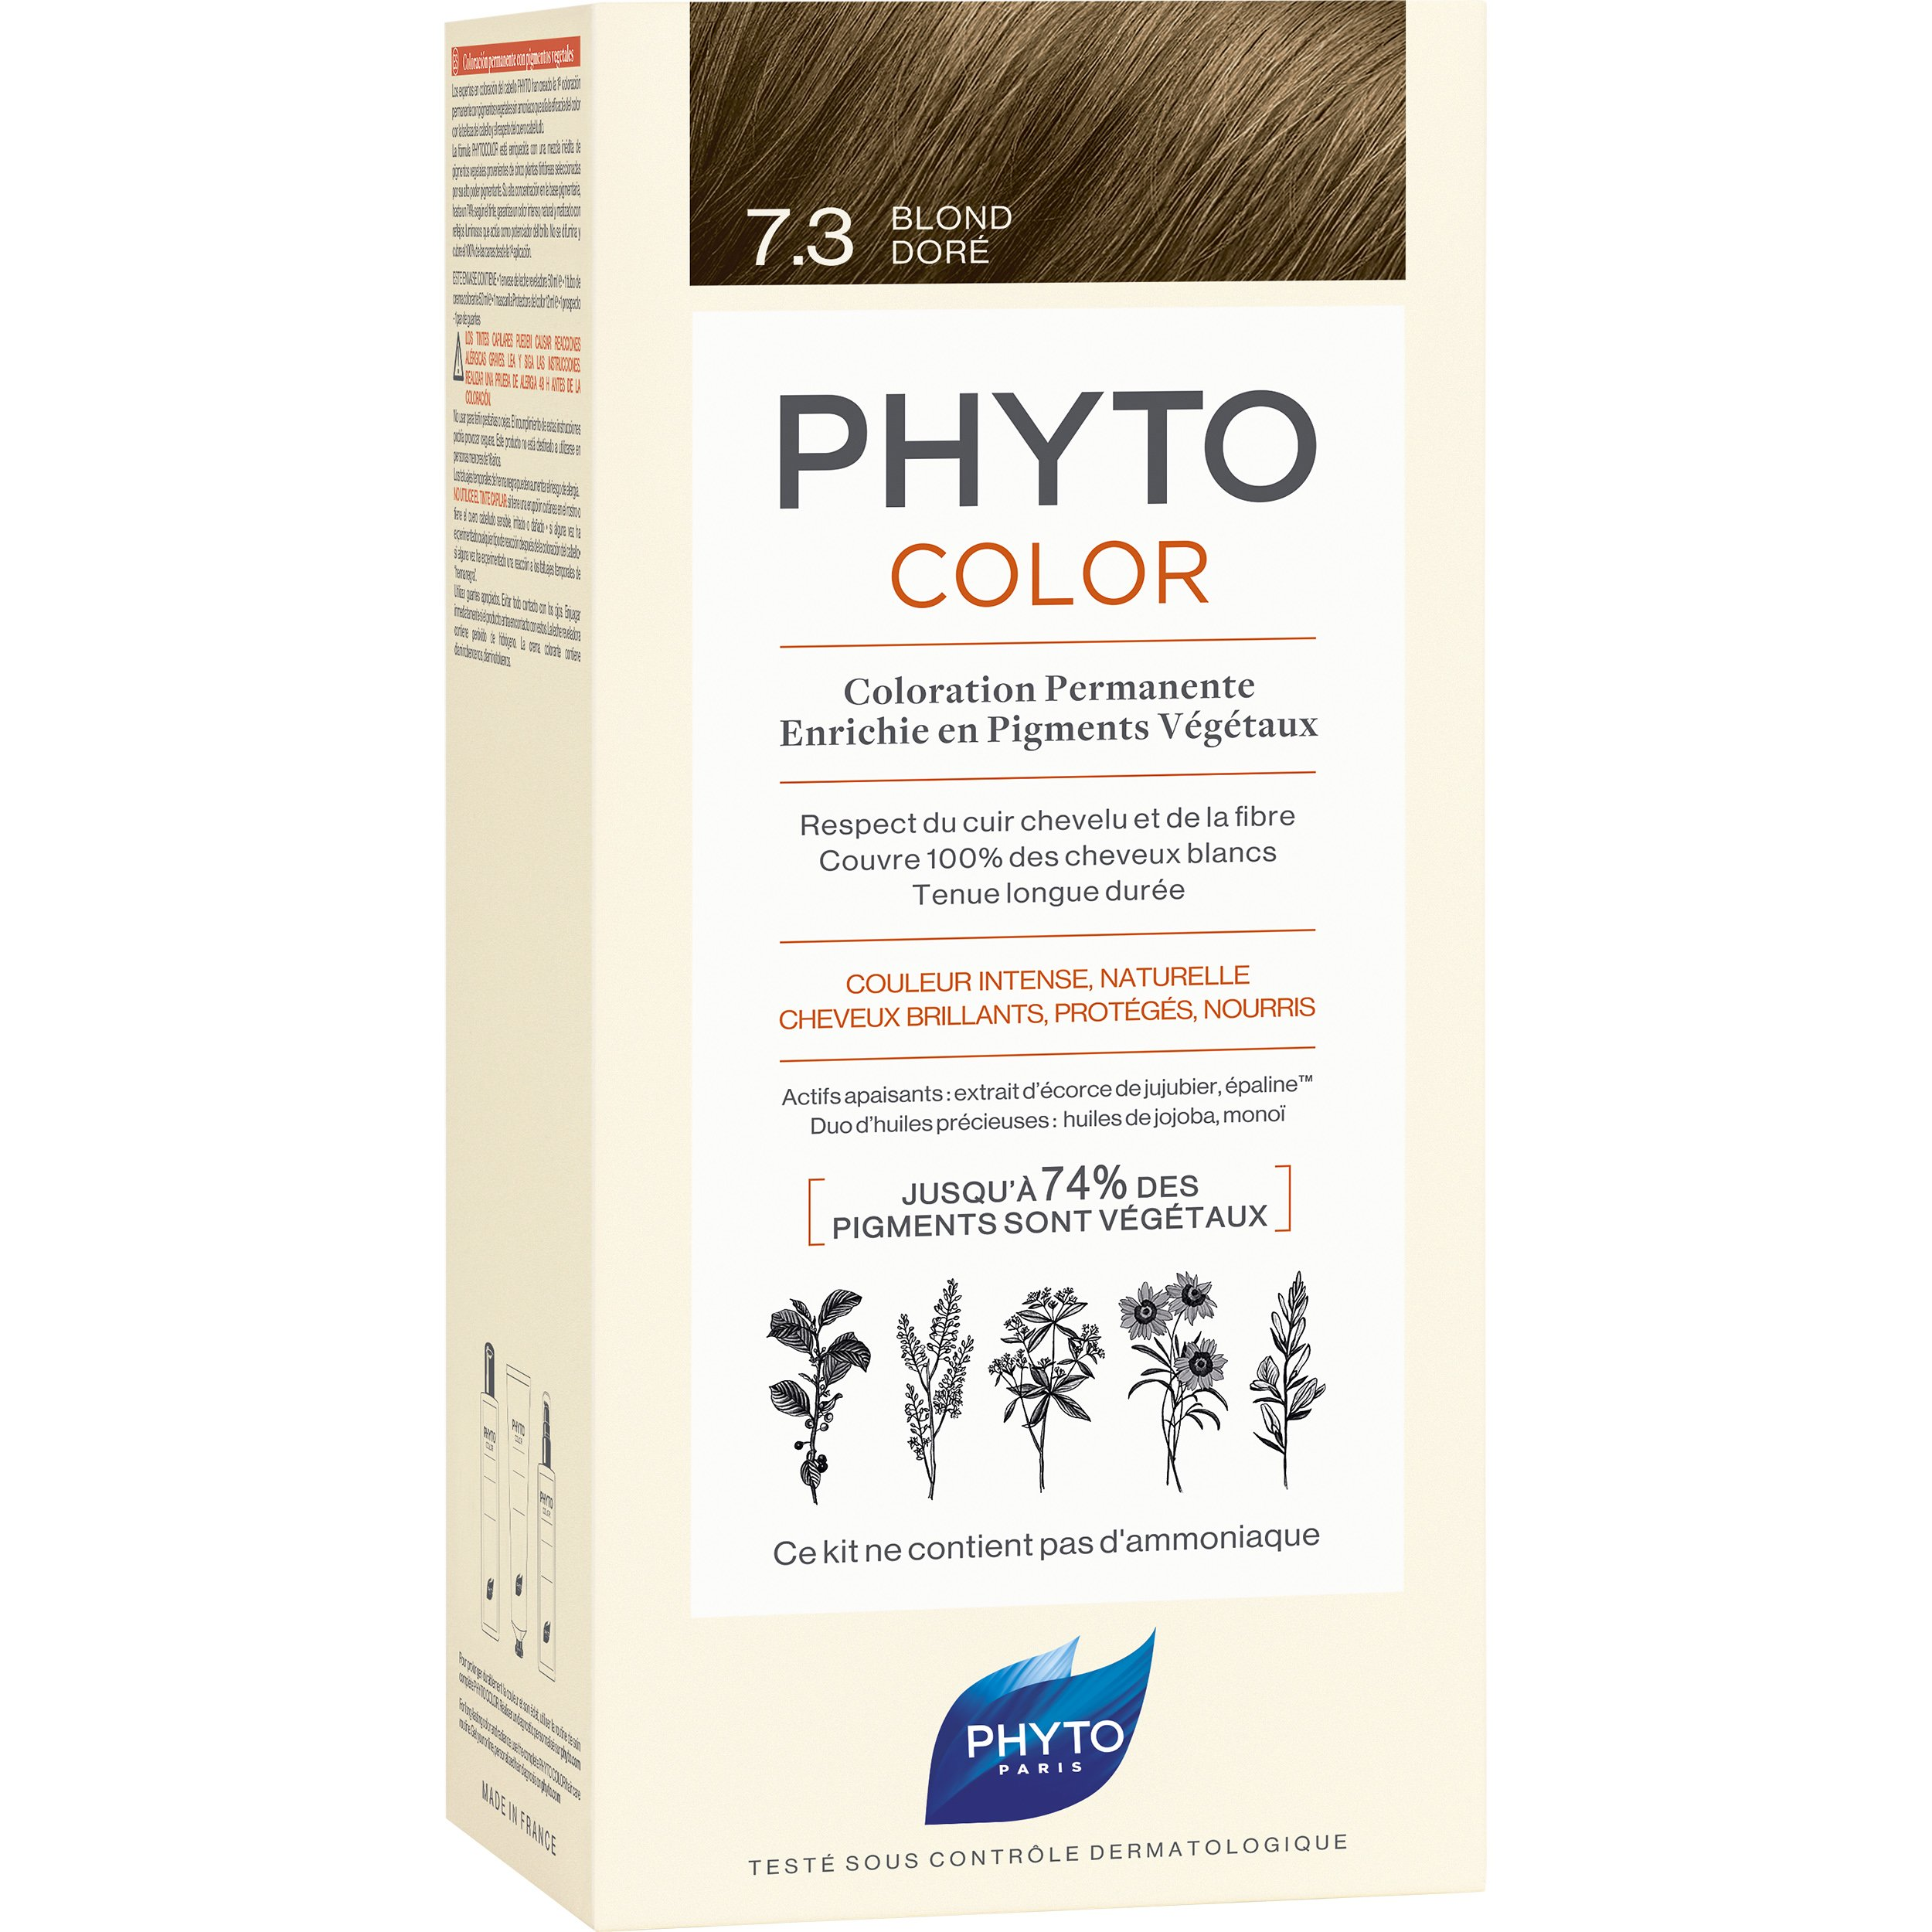 Phyto PhytoColor Coloration Permanente η No1 Μόνιμη Βαφή Μαλλιών Χωρίς Χρωστικές Ουσίες & Αμμωνία – 7.3 Ξανθό Χρυσό